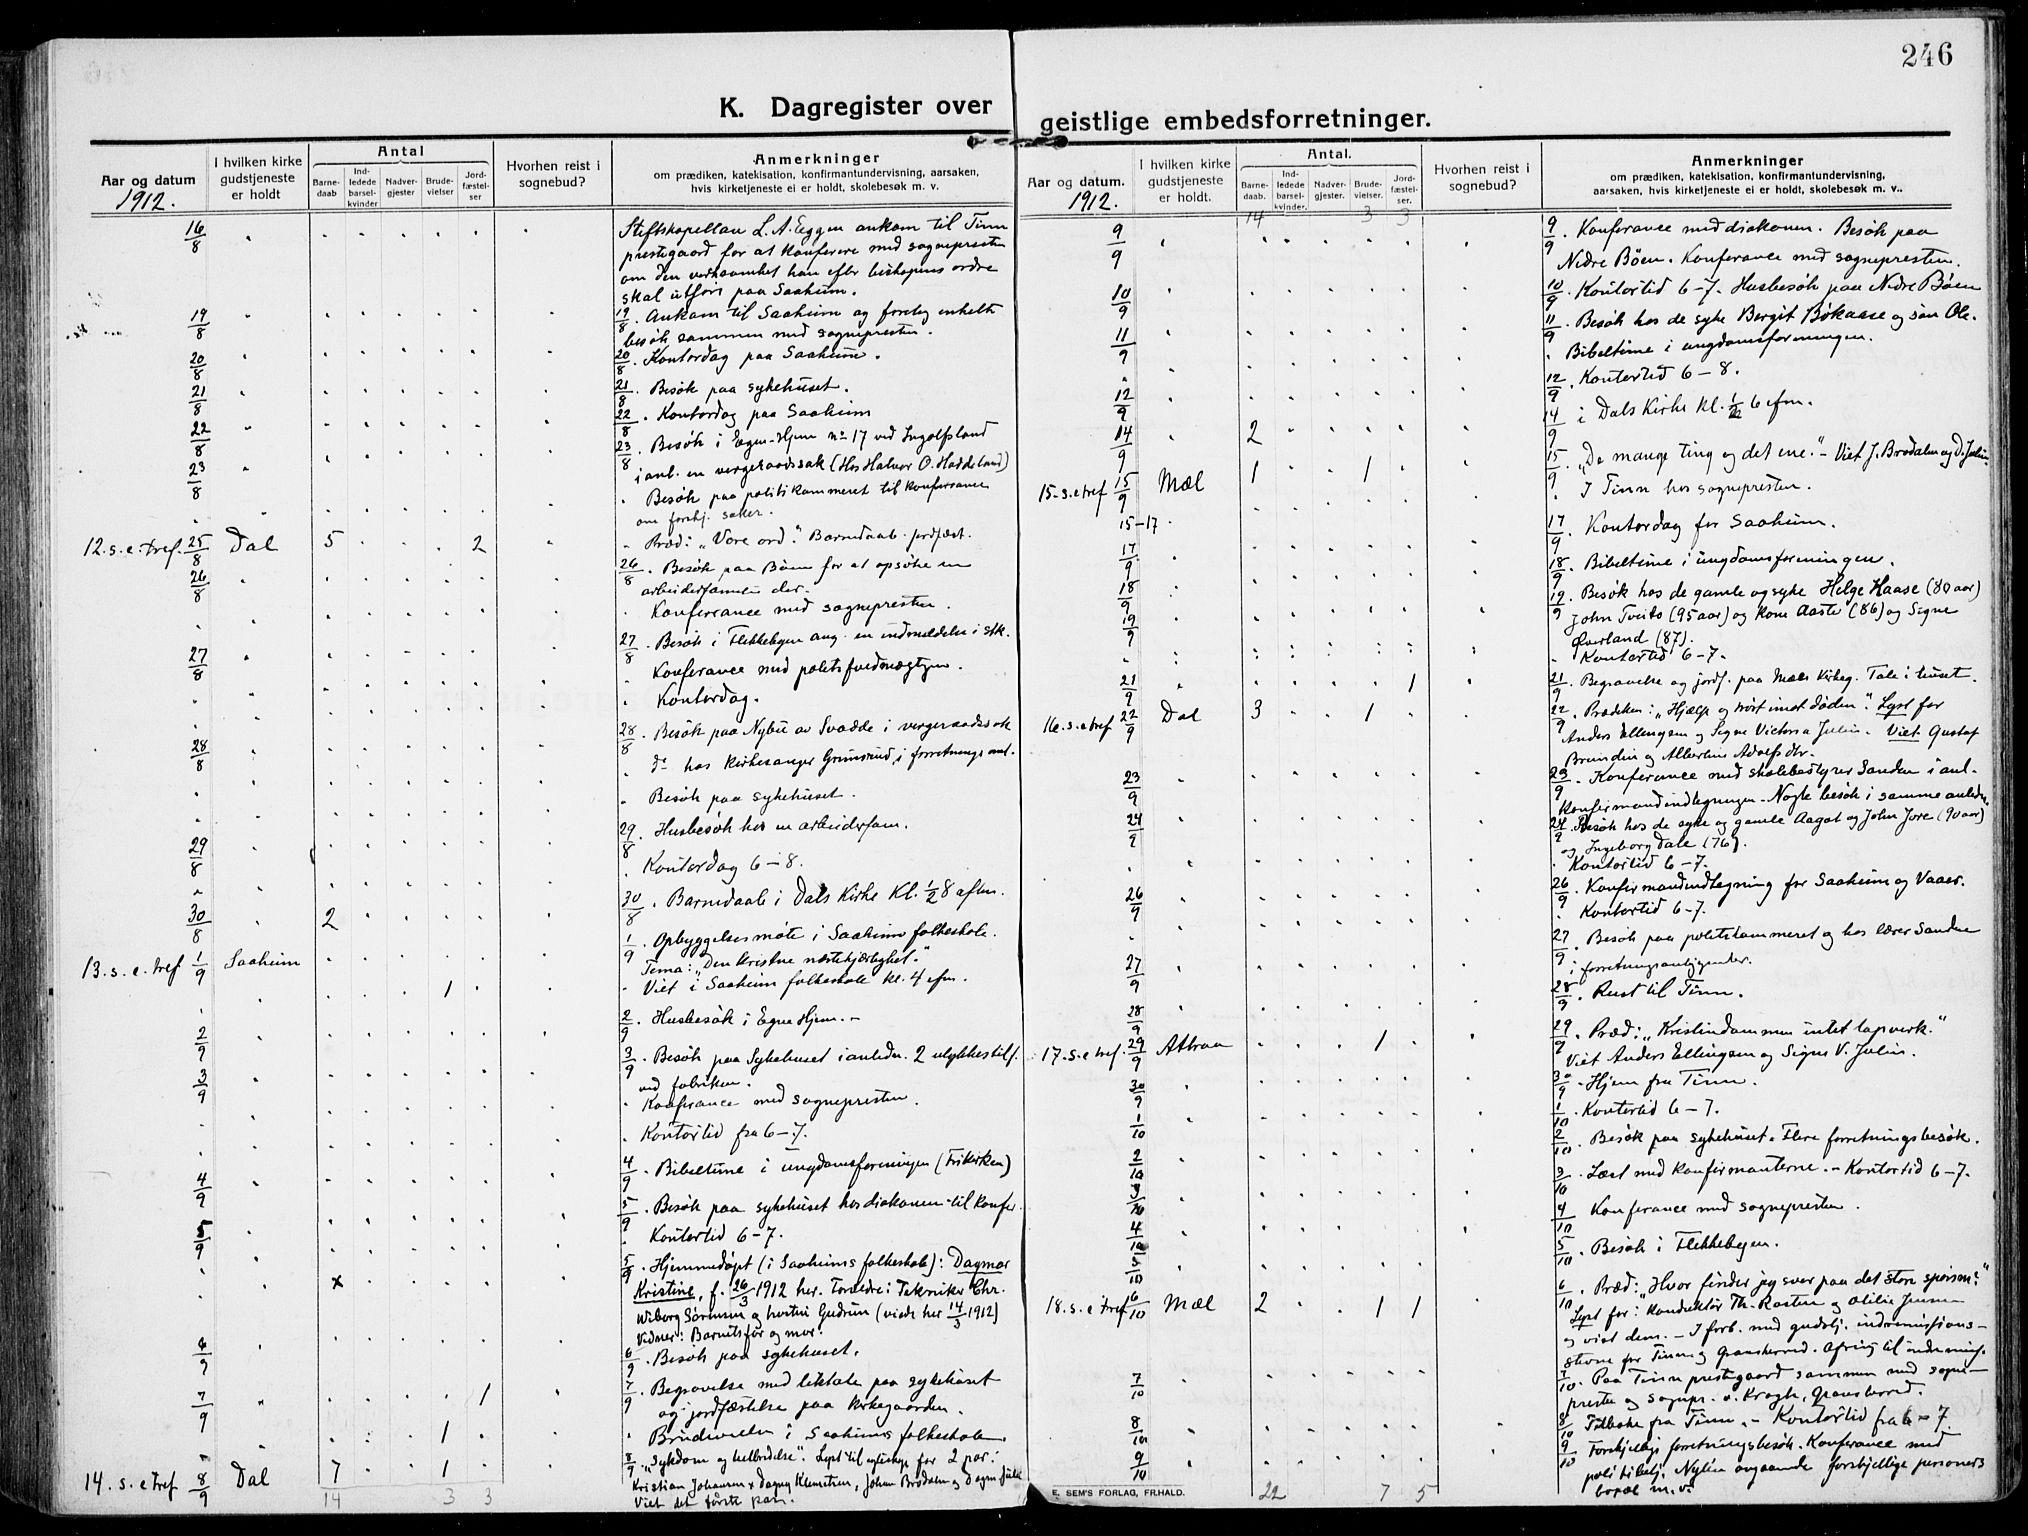 SAKO, Rjukan kirkebøker, F/Fa/L0002: Ministerialbok nr. 2, 1912-1917, s. 246